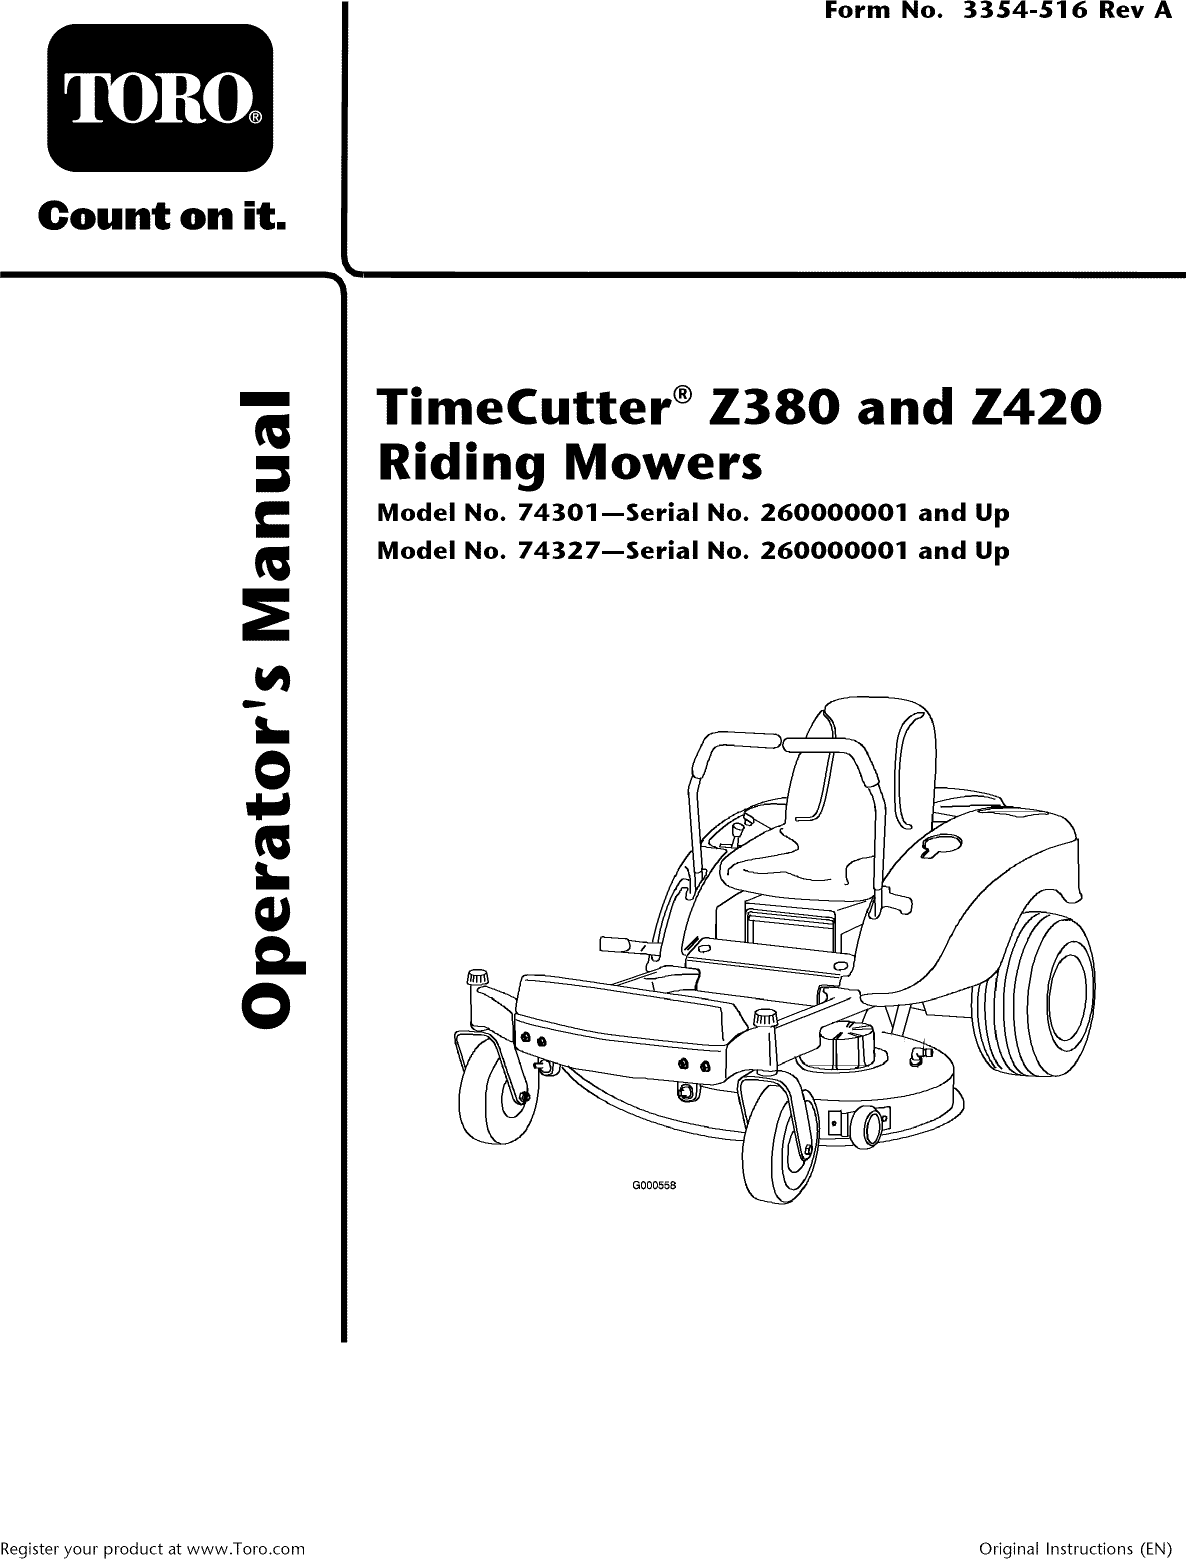 hight resolution of full size in new window array toro 74327 260000001 260019999 user manual riding mower manuals rh usermanual wiki